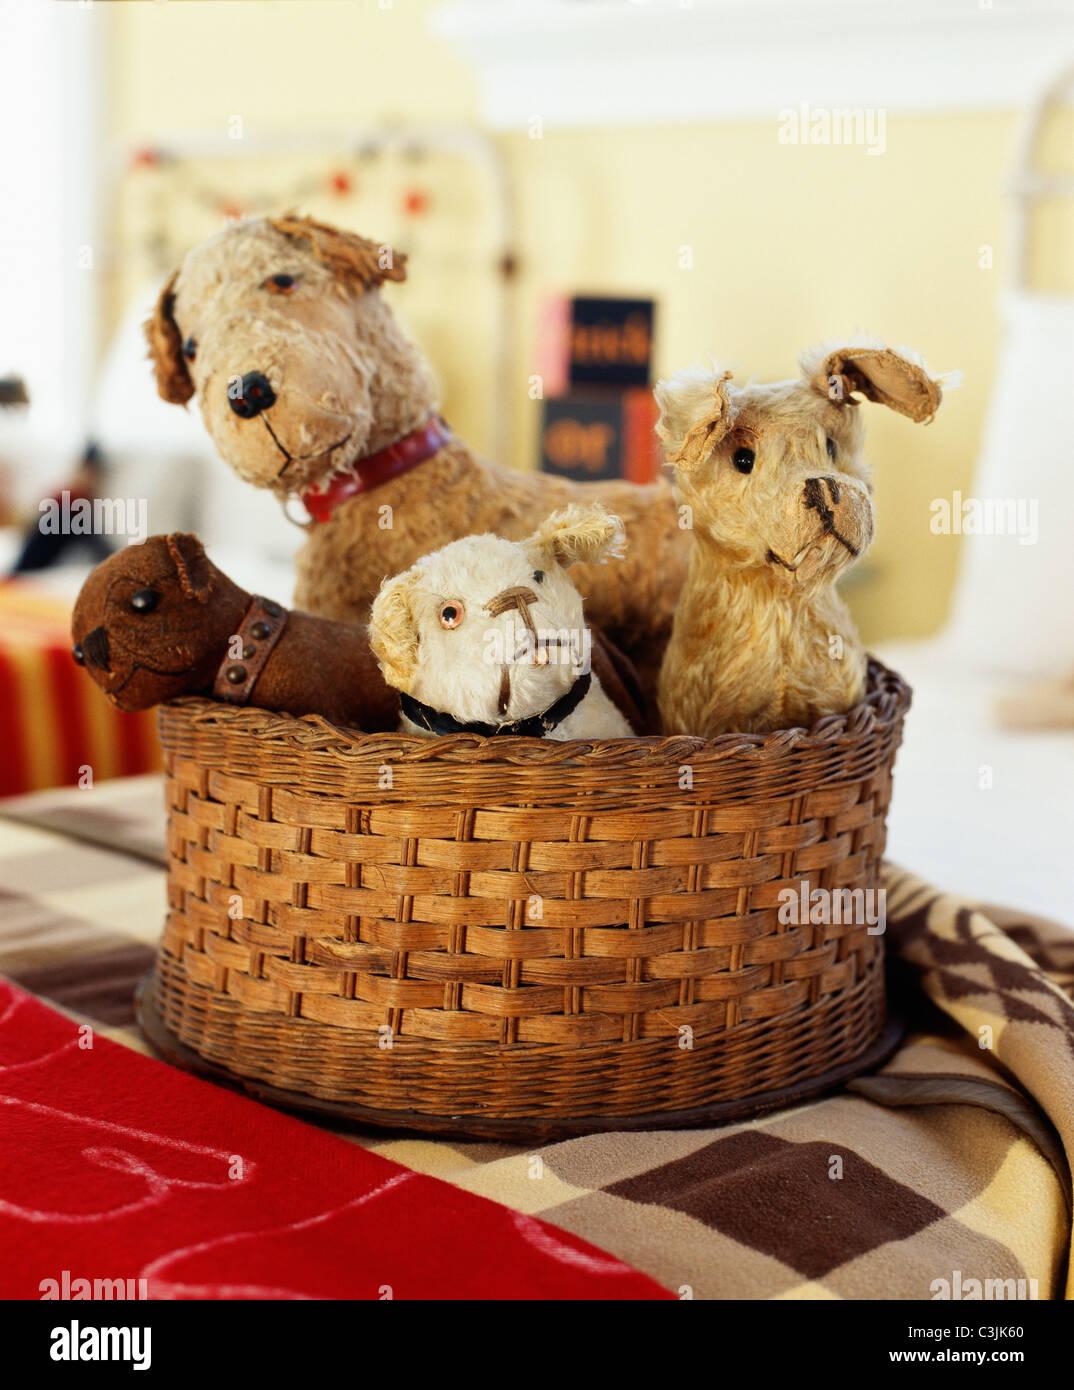 Basket of vintage stuffed animals. - Stock Image